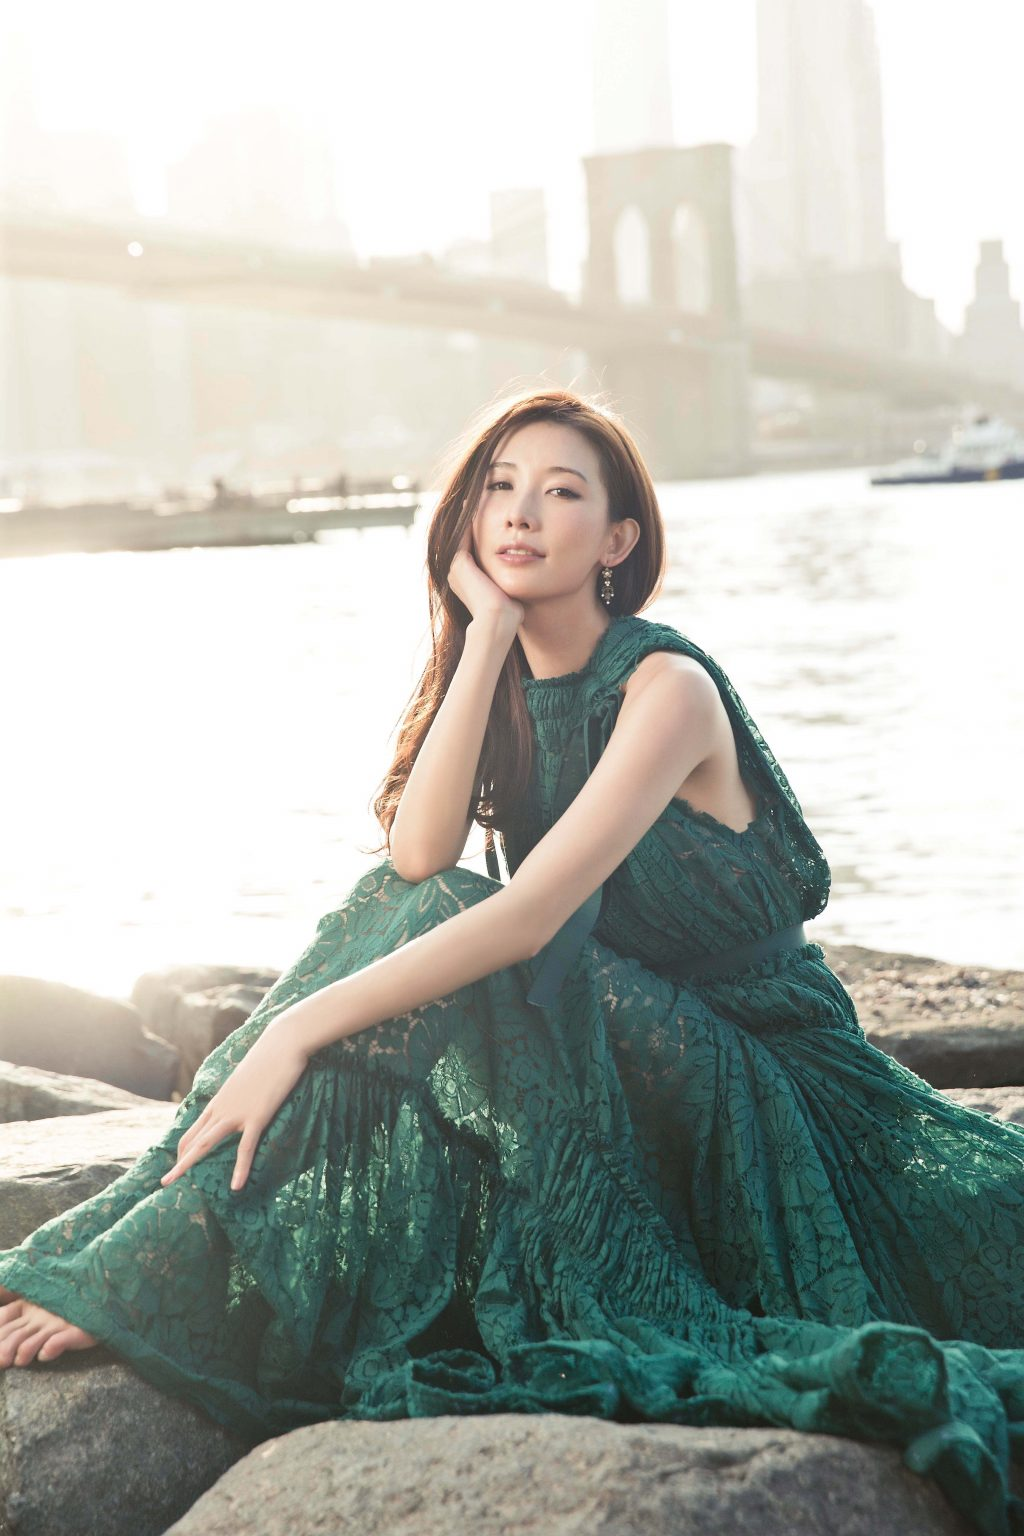 H&M Foundation thời trang bền vững 16